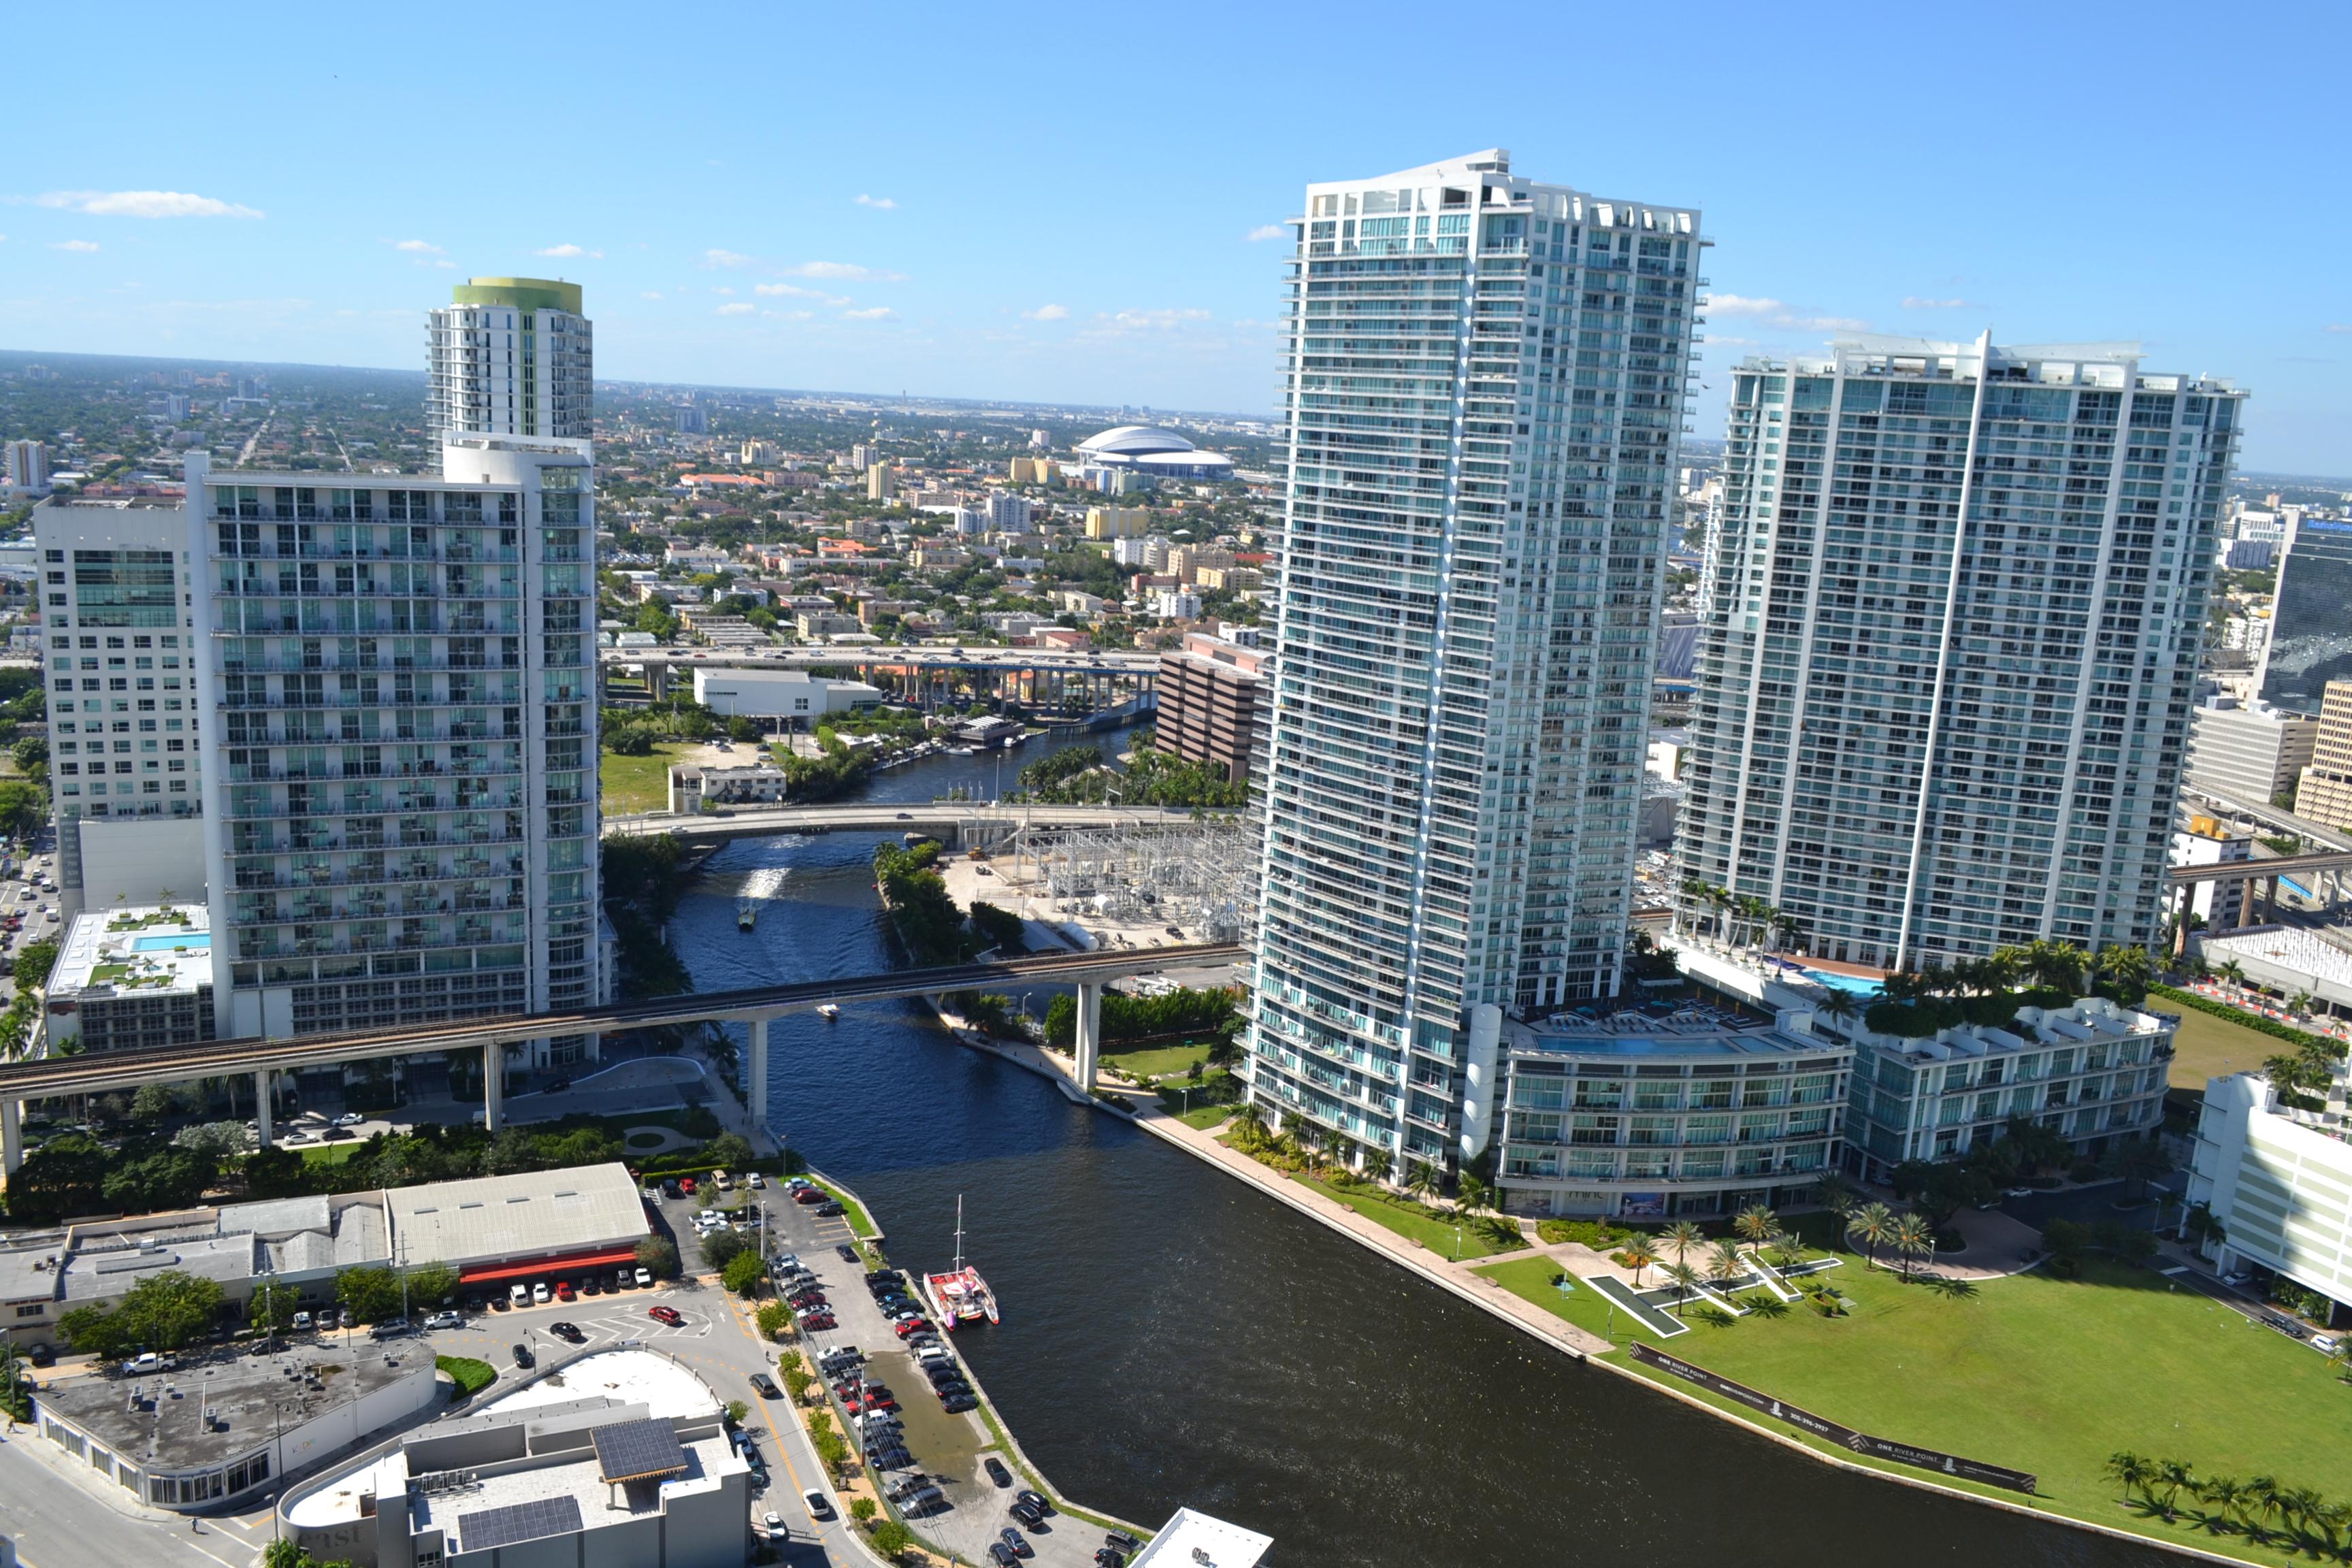 Condominium for Sale at 68 Se 6 Street #3606 68 Se 6 Street 3606 Miami, Florida, 33131 United States